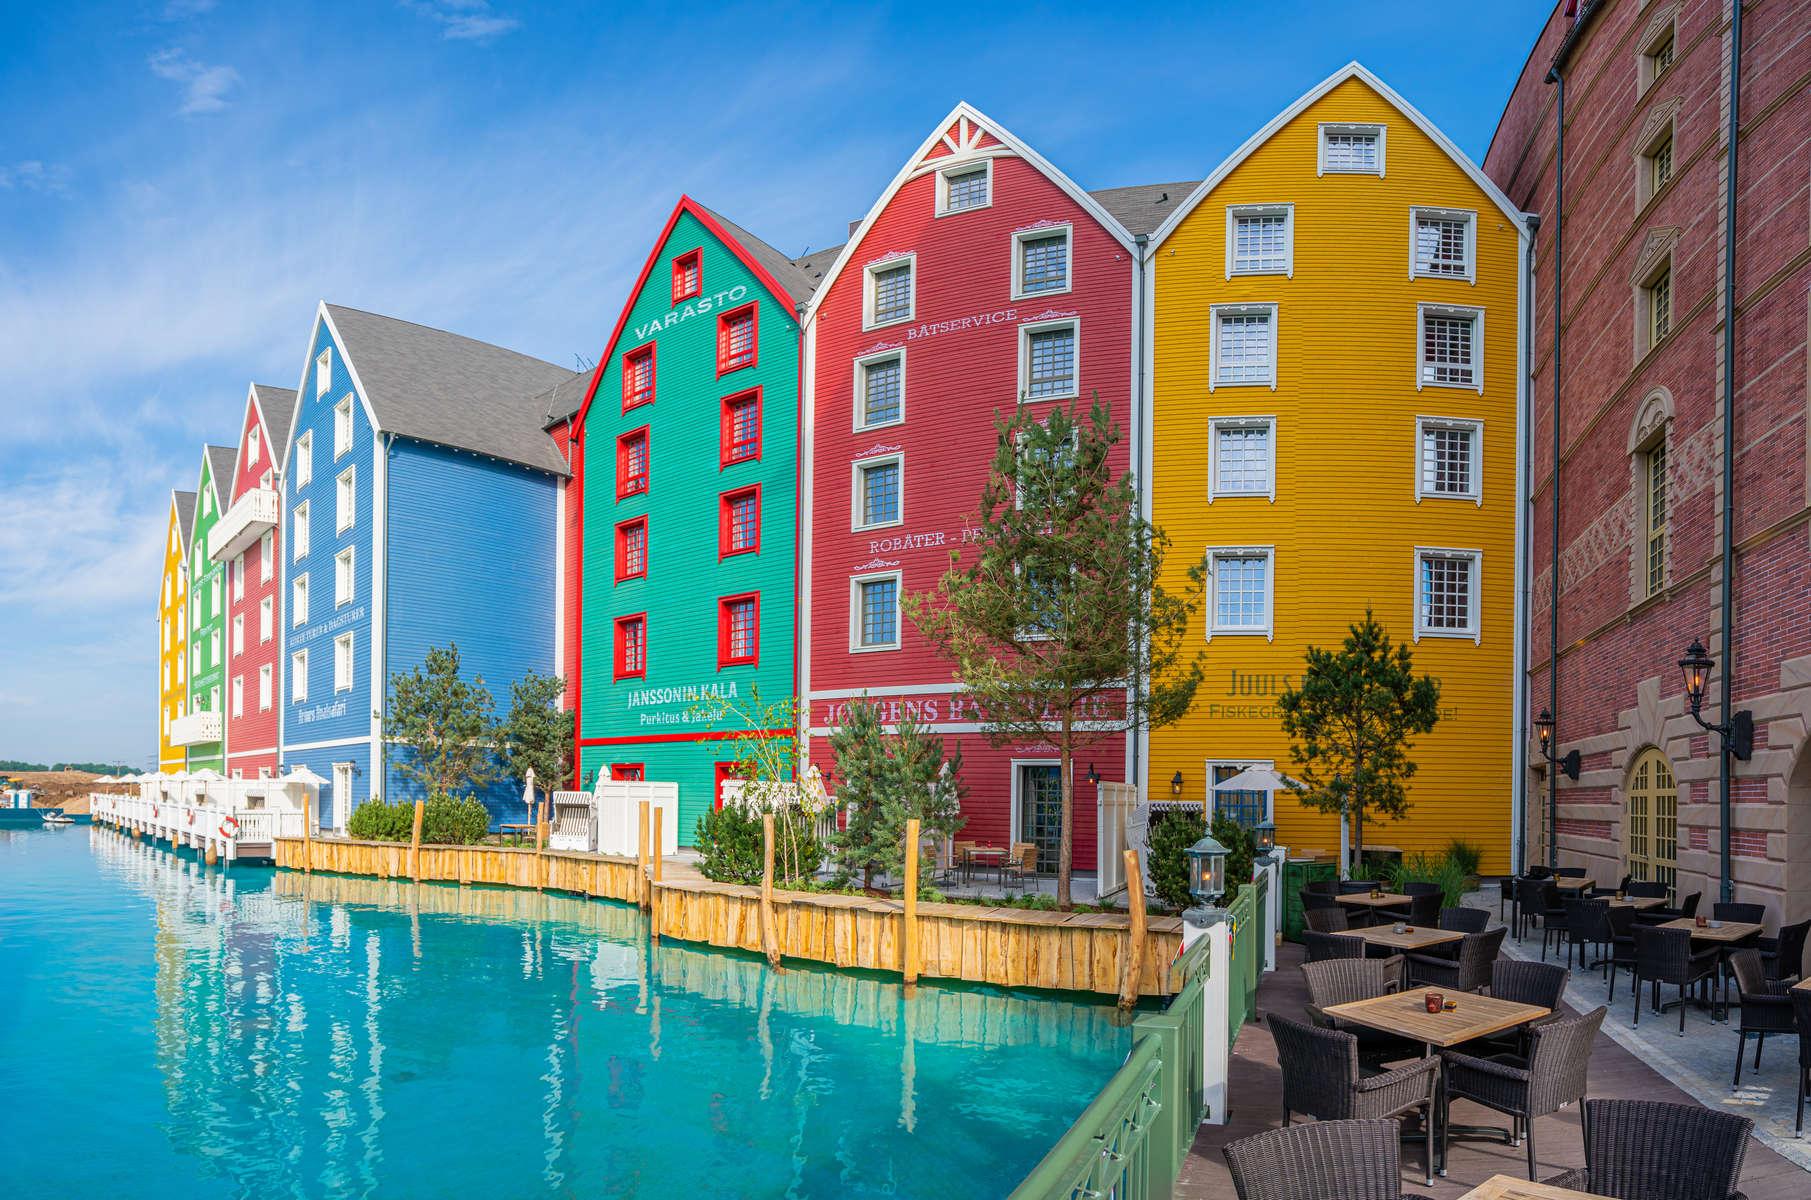 Ortenau Lebenshilfe Stattet Europa Park Hotel Kronasar Mit Betten